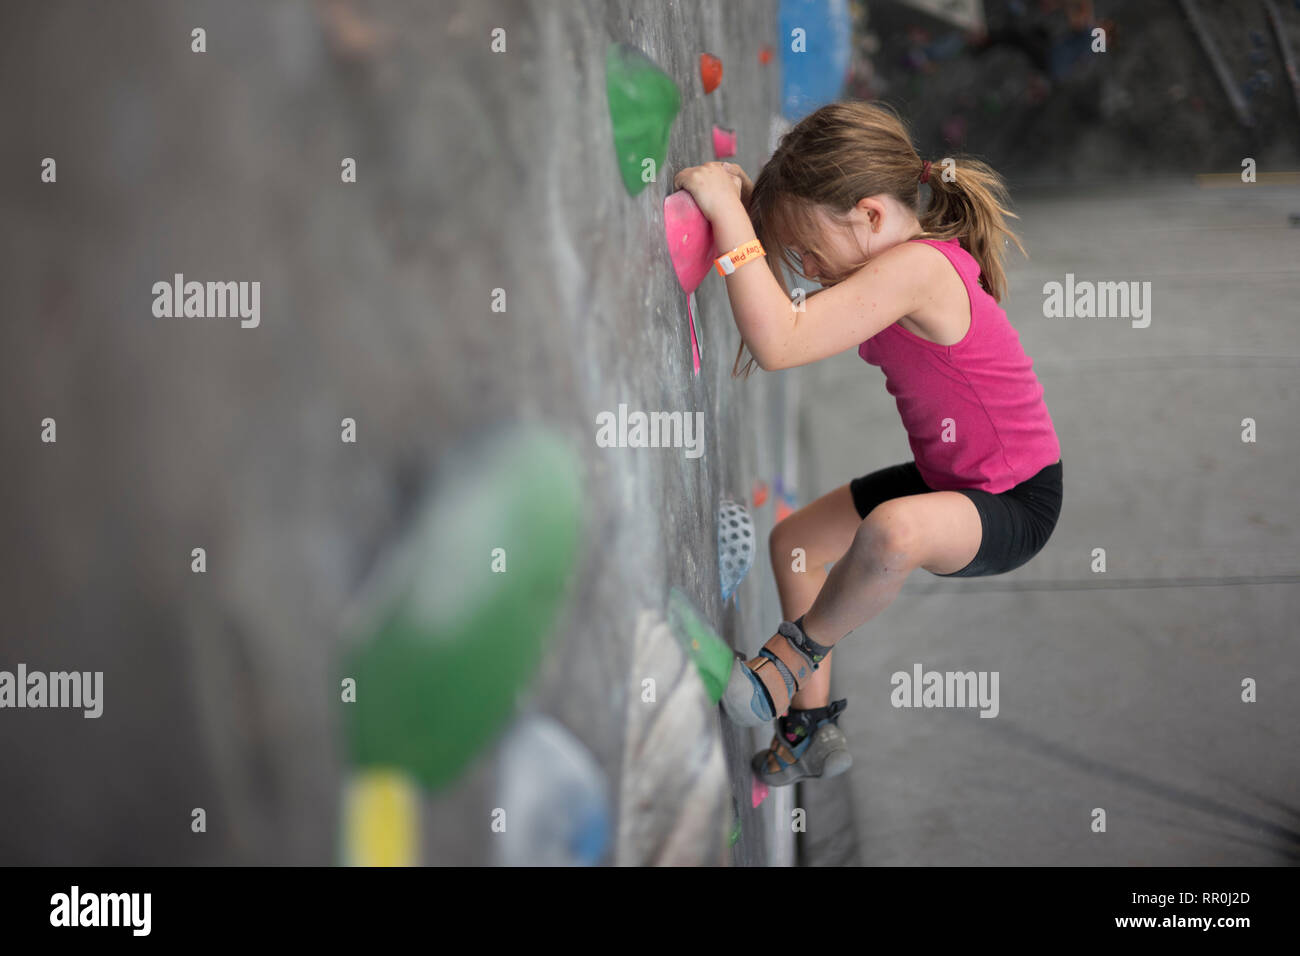 Young Girl climbing at indoor climbing gym - Stock Image